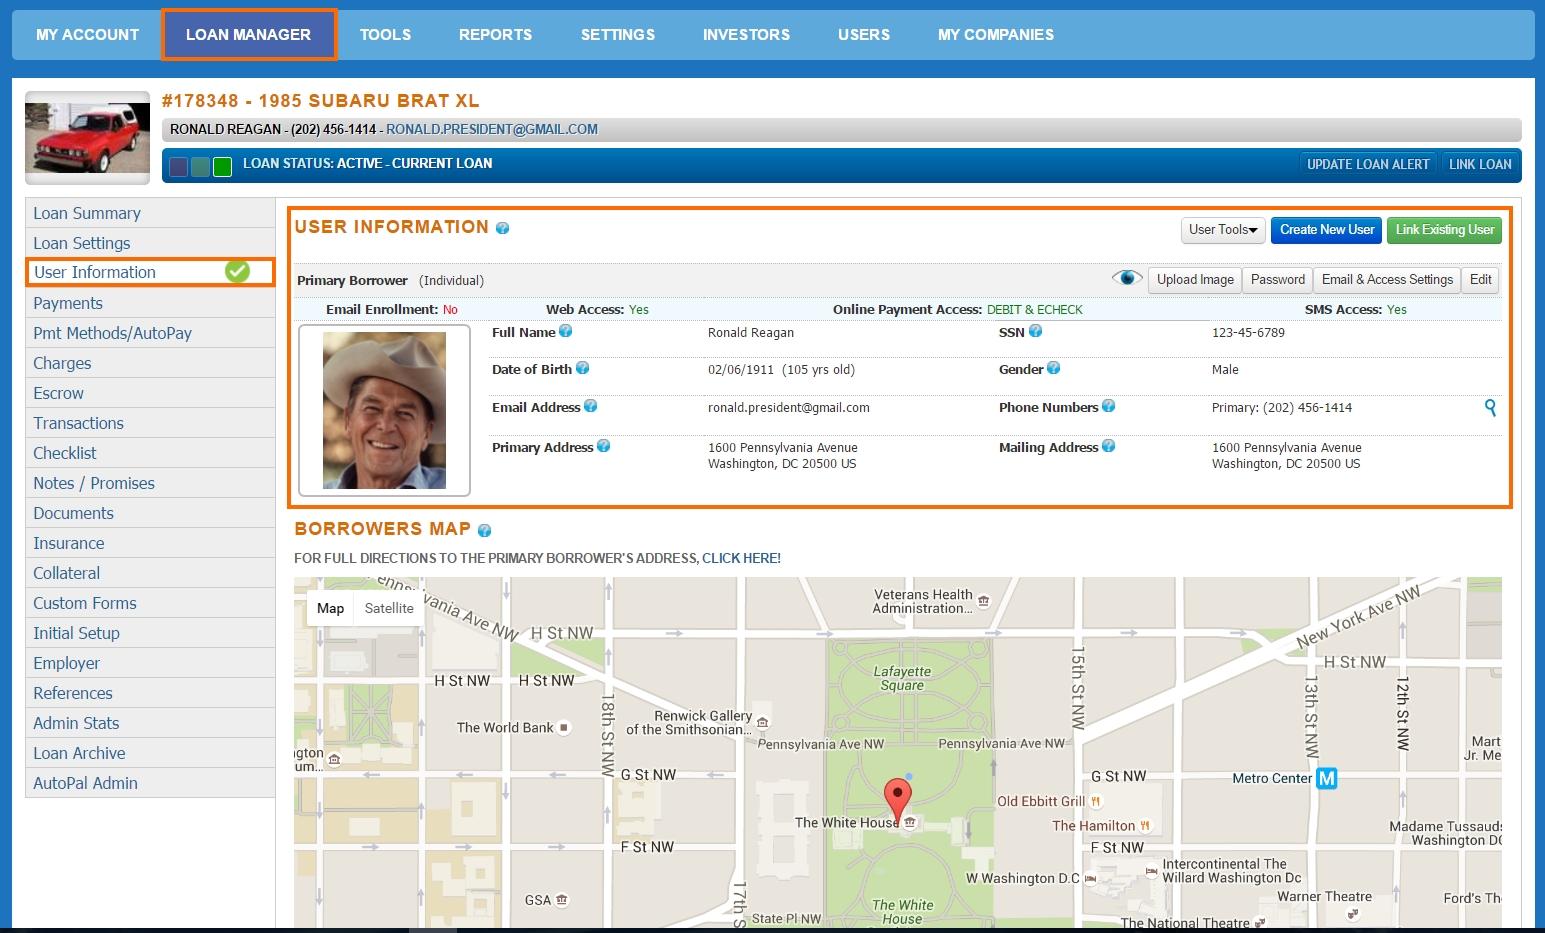 Loan Manager - User Information